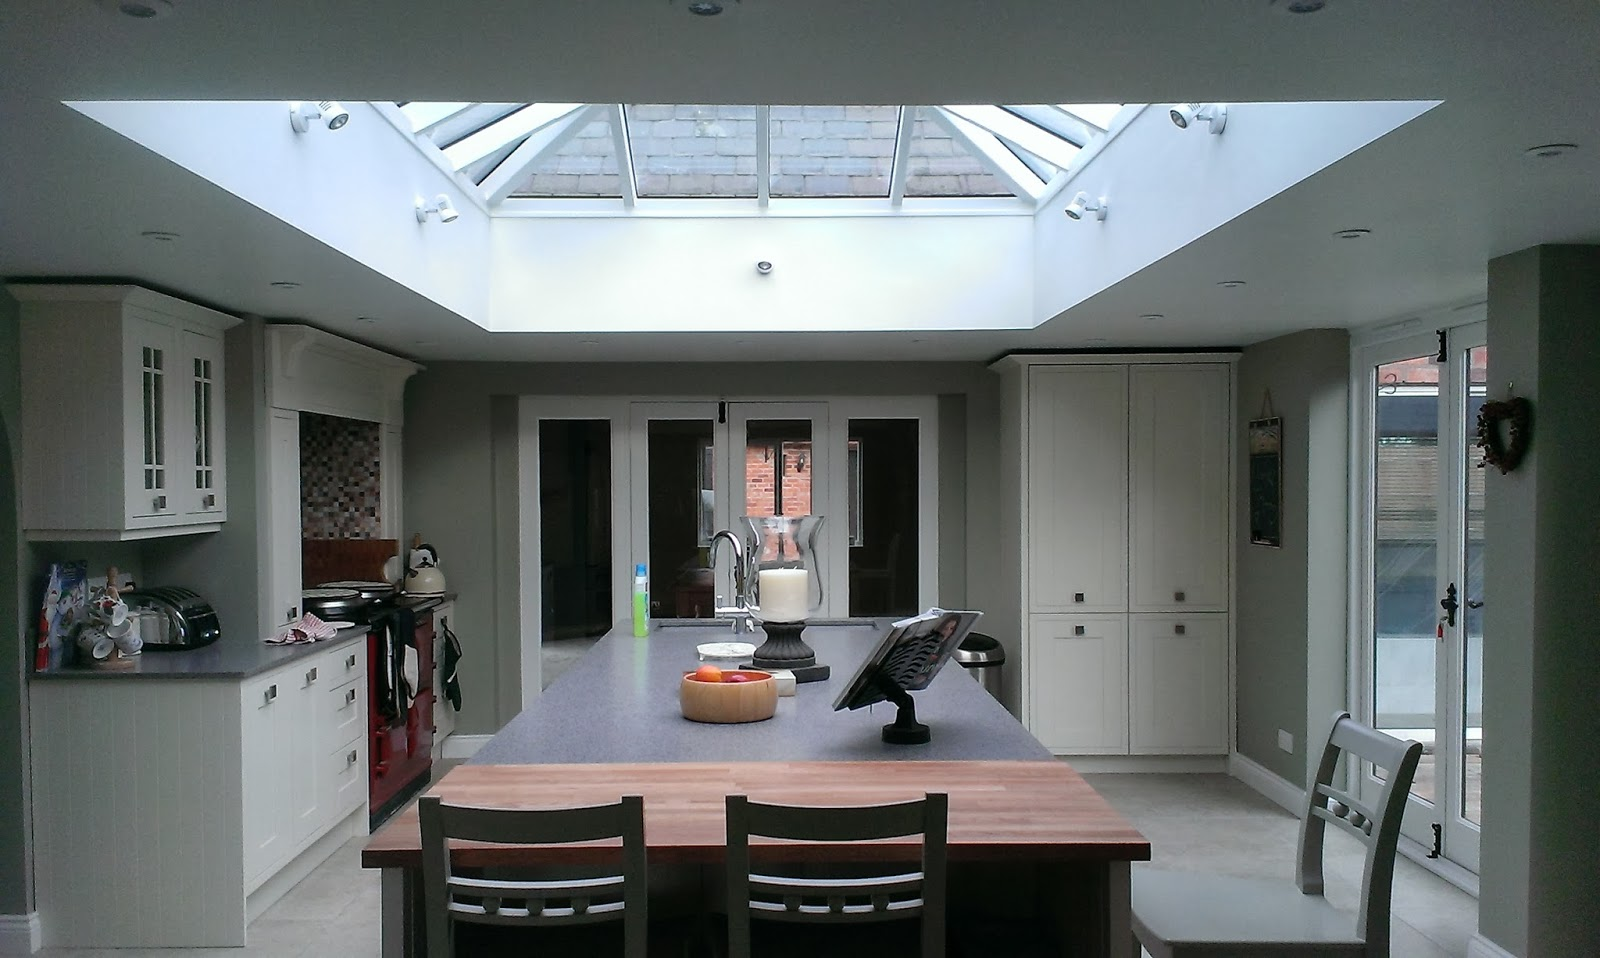 star gazing roof lantern for your home lantern kitchen lighting Roof Lantern Lantern Light Kitchen Lisa Melvin Design